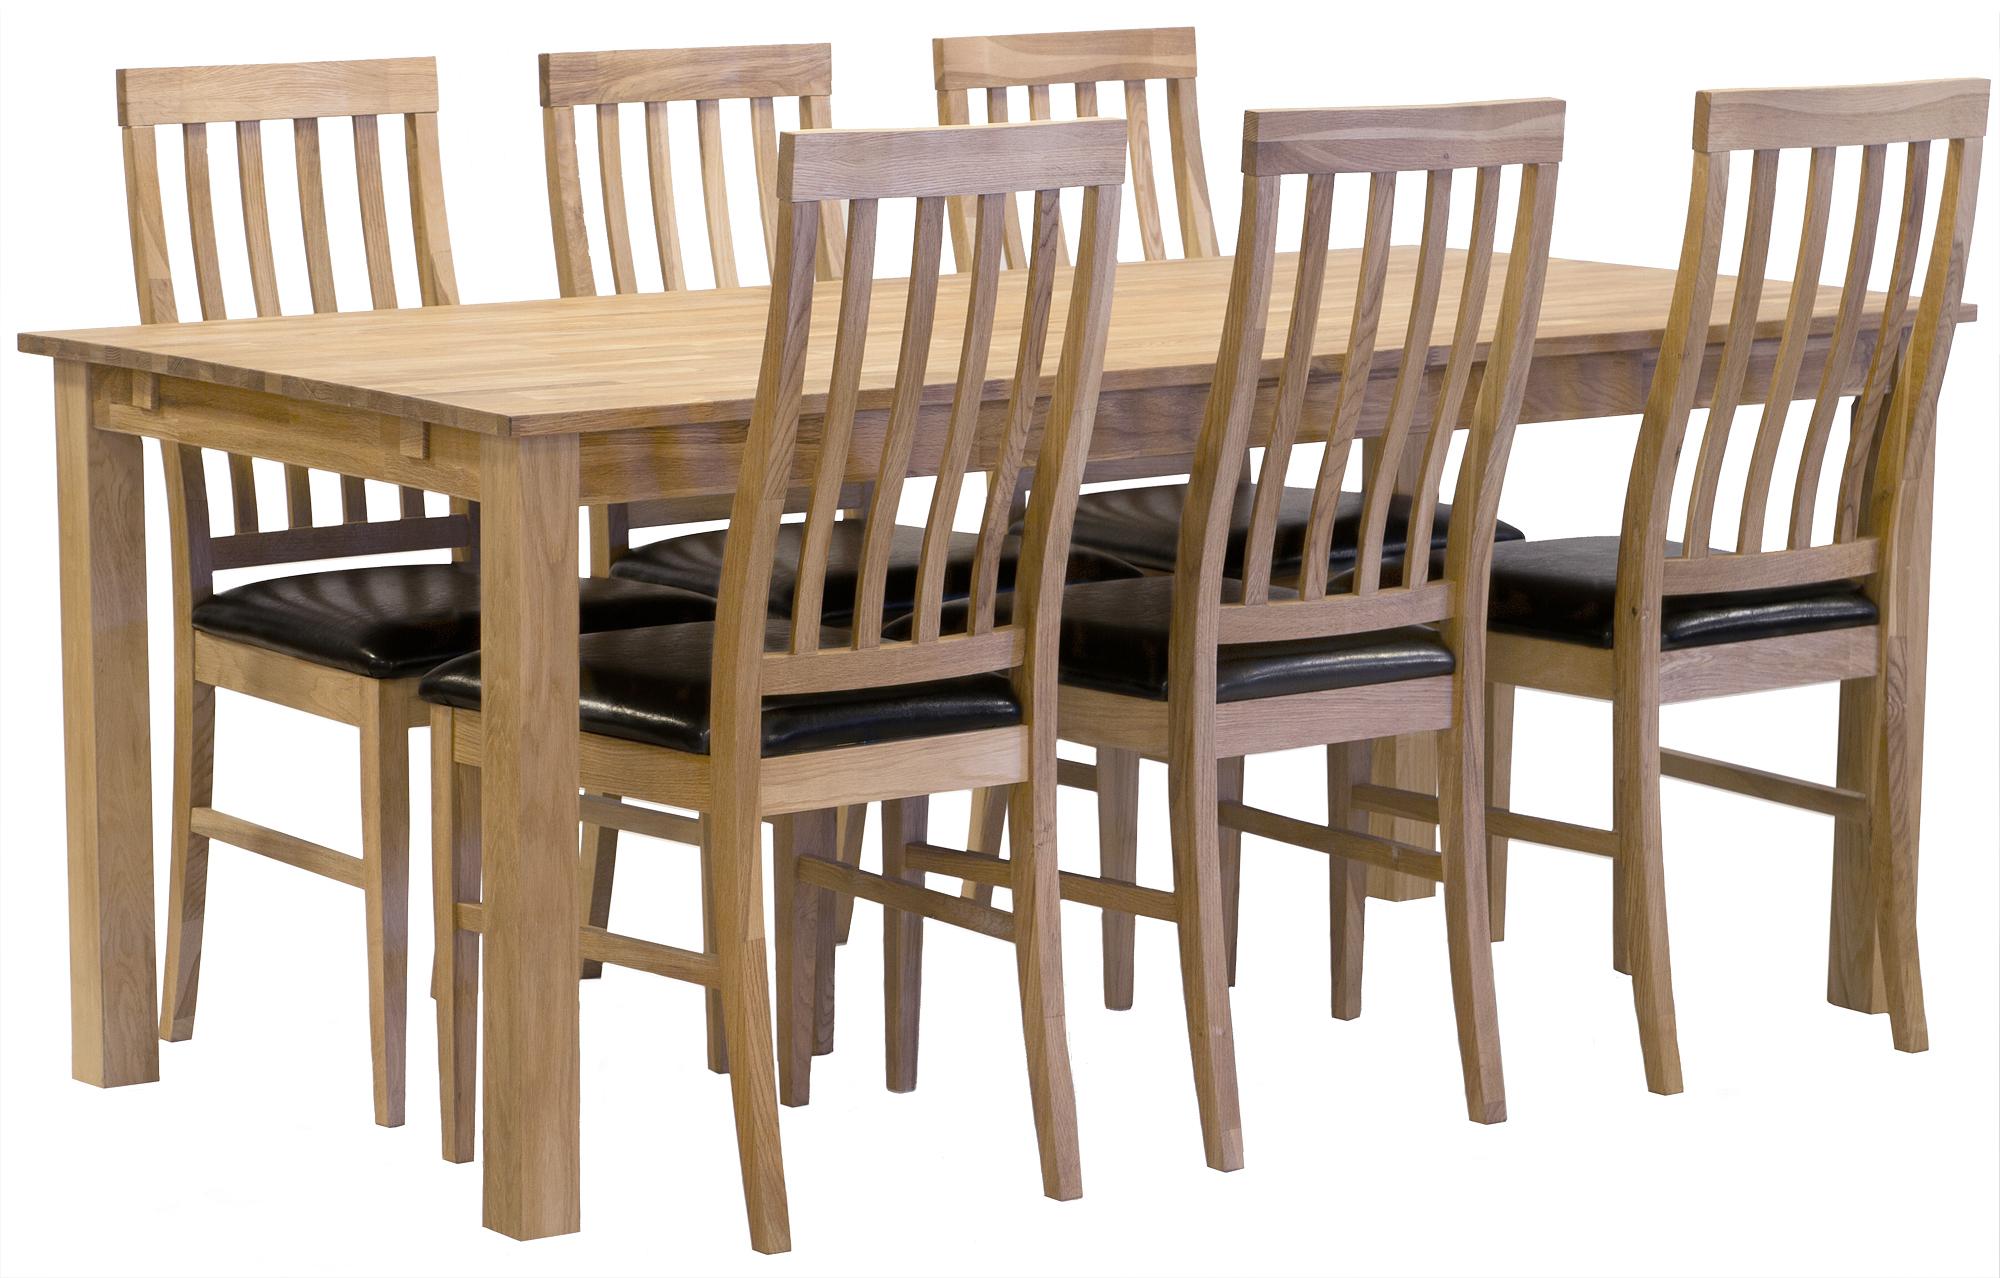 Matgrupp: Ekehof matbord oljad ek 180 cm + 6 st Lilian